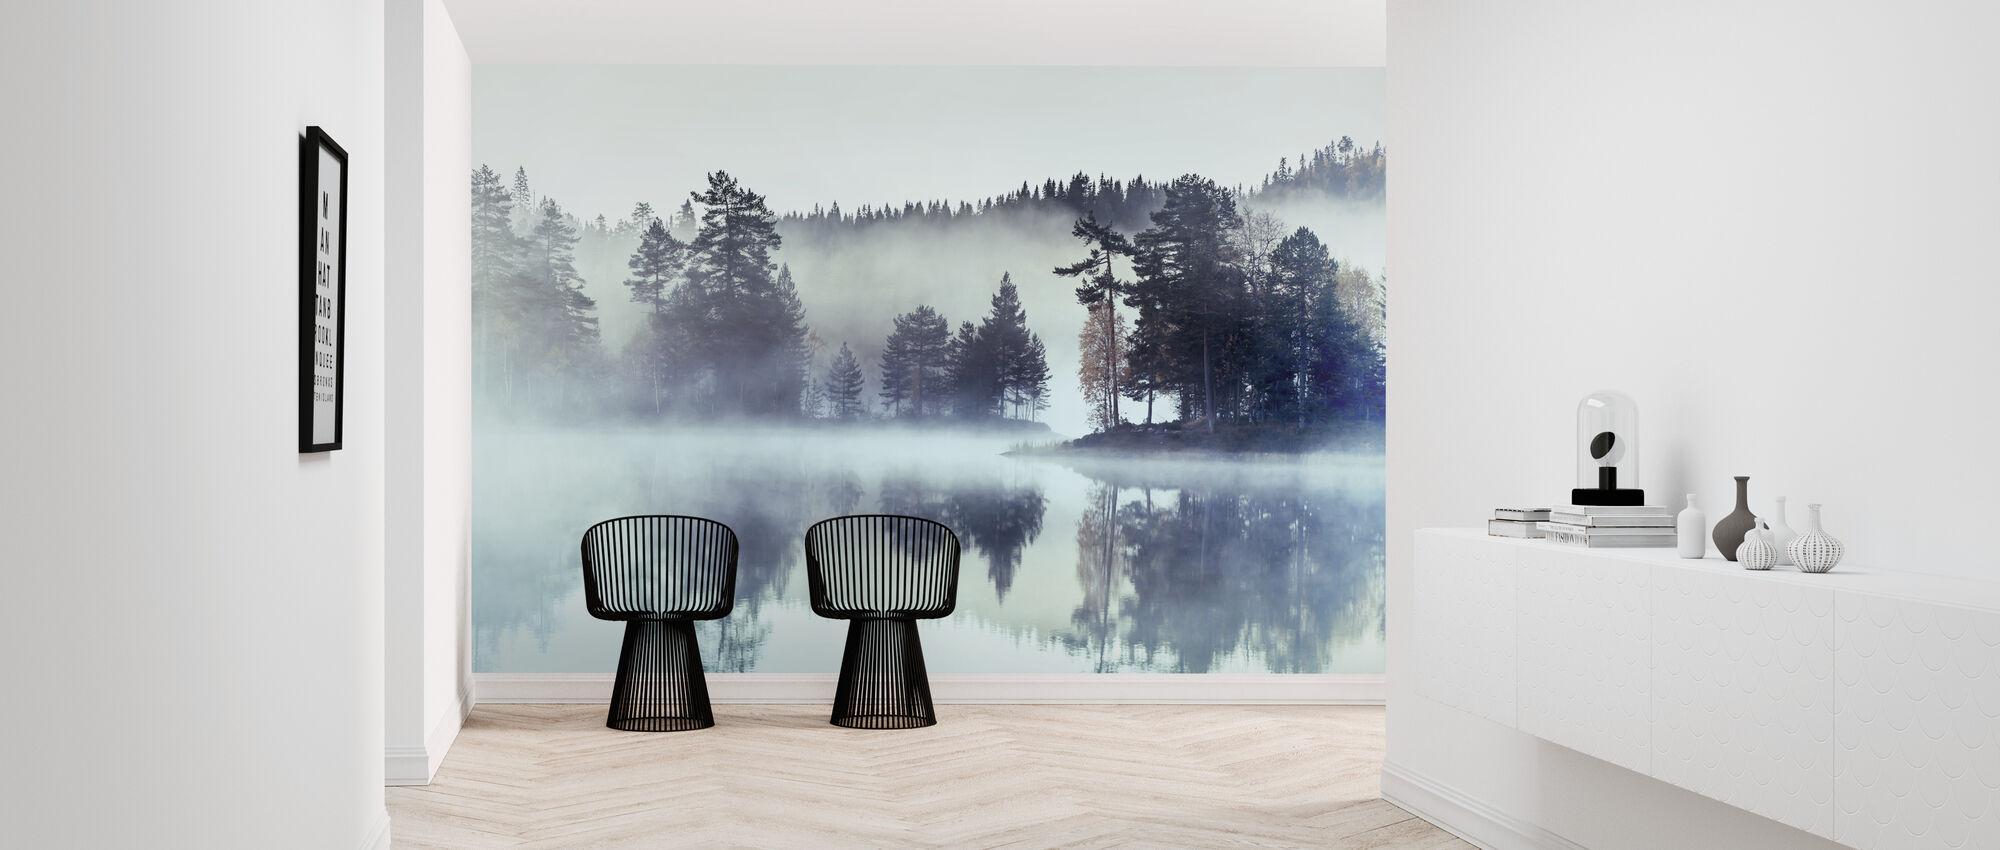 Forest Fog and Mist - Wallpaper - Hallway